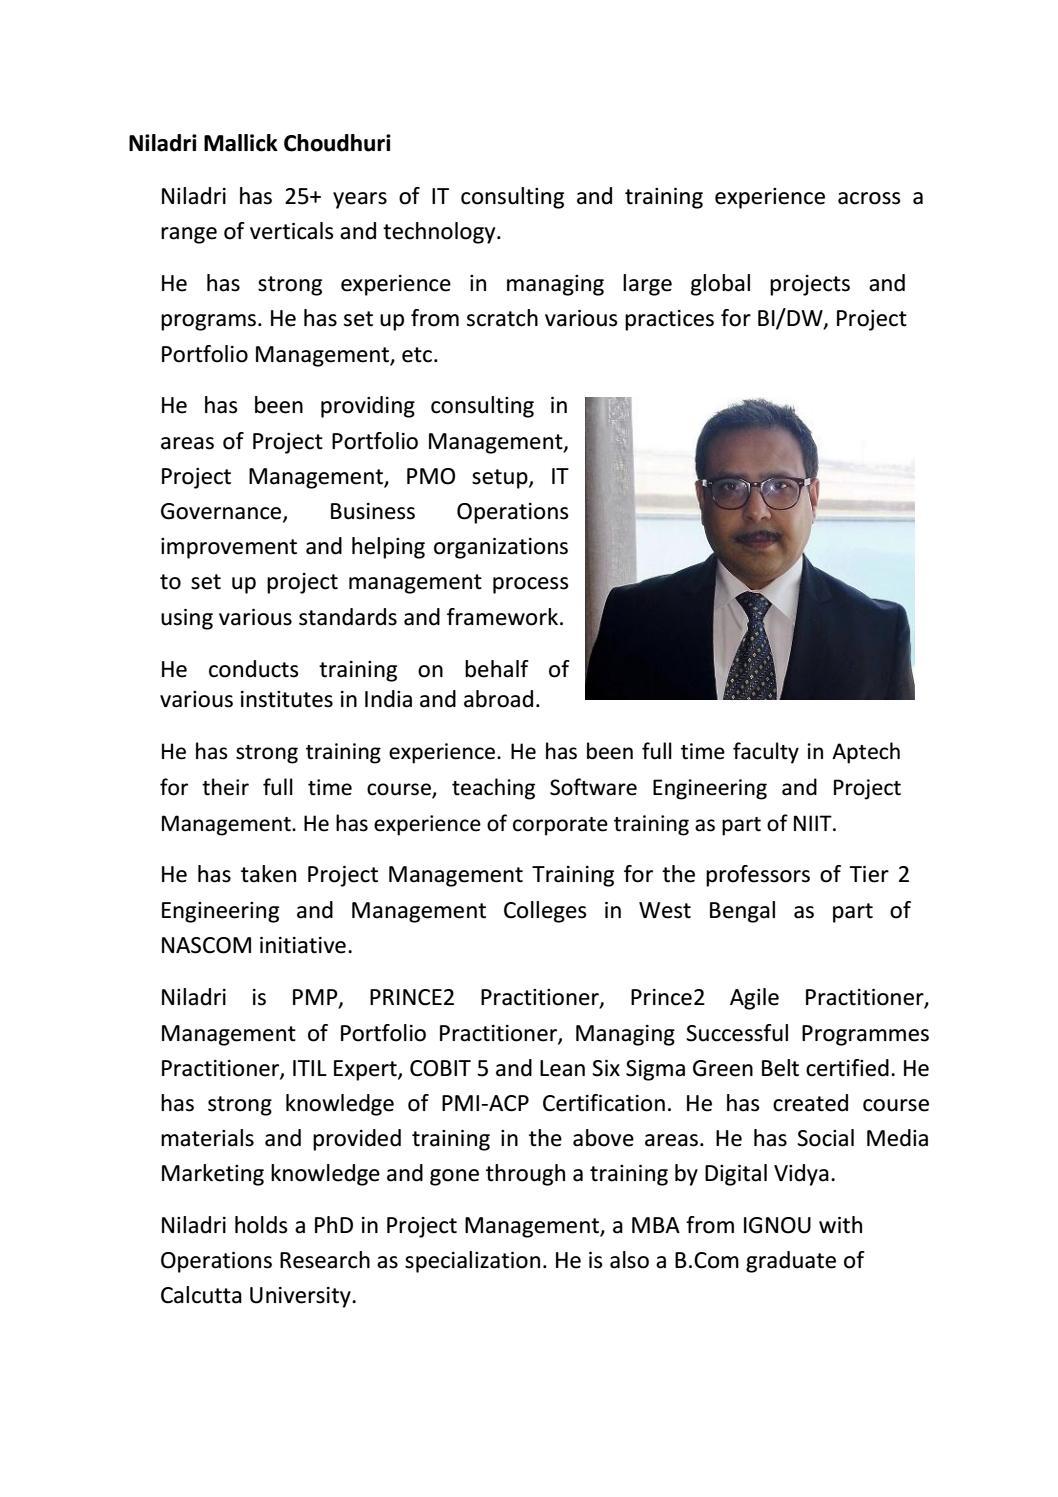 Nmc Training For It Aspiring Professionals By Xellentrocom Issuu